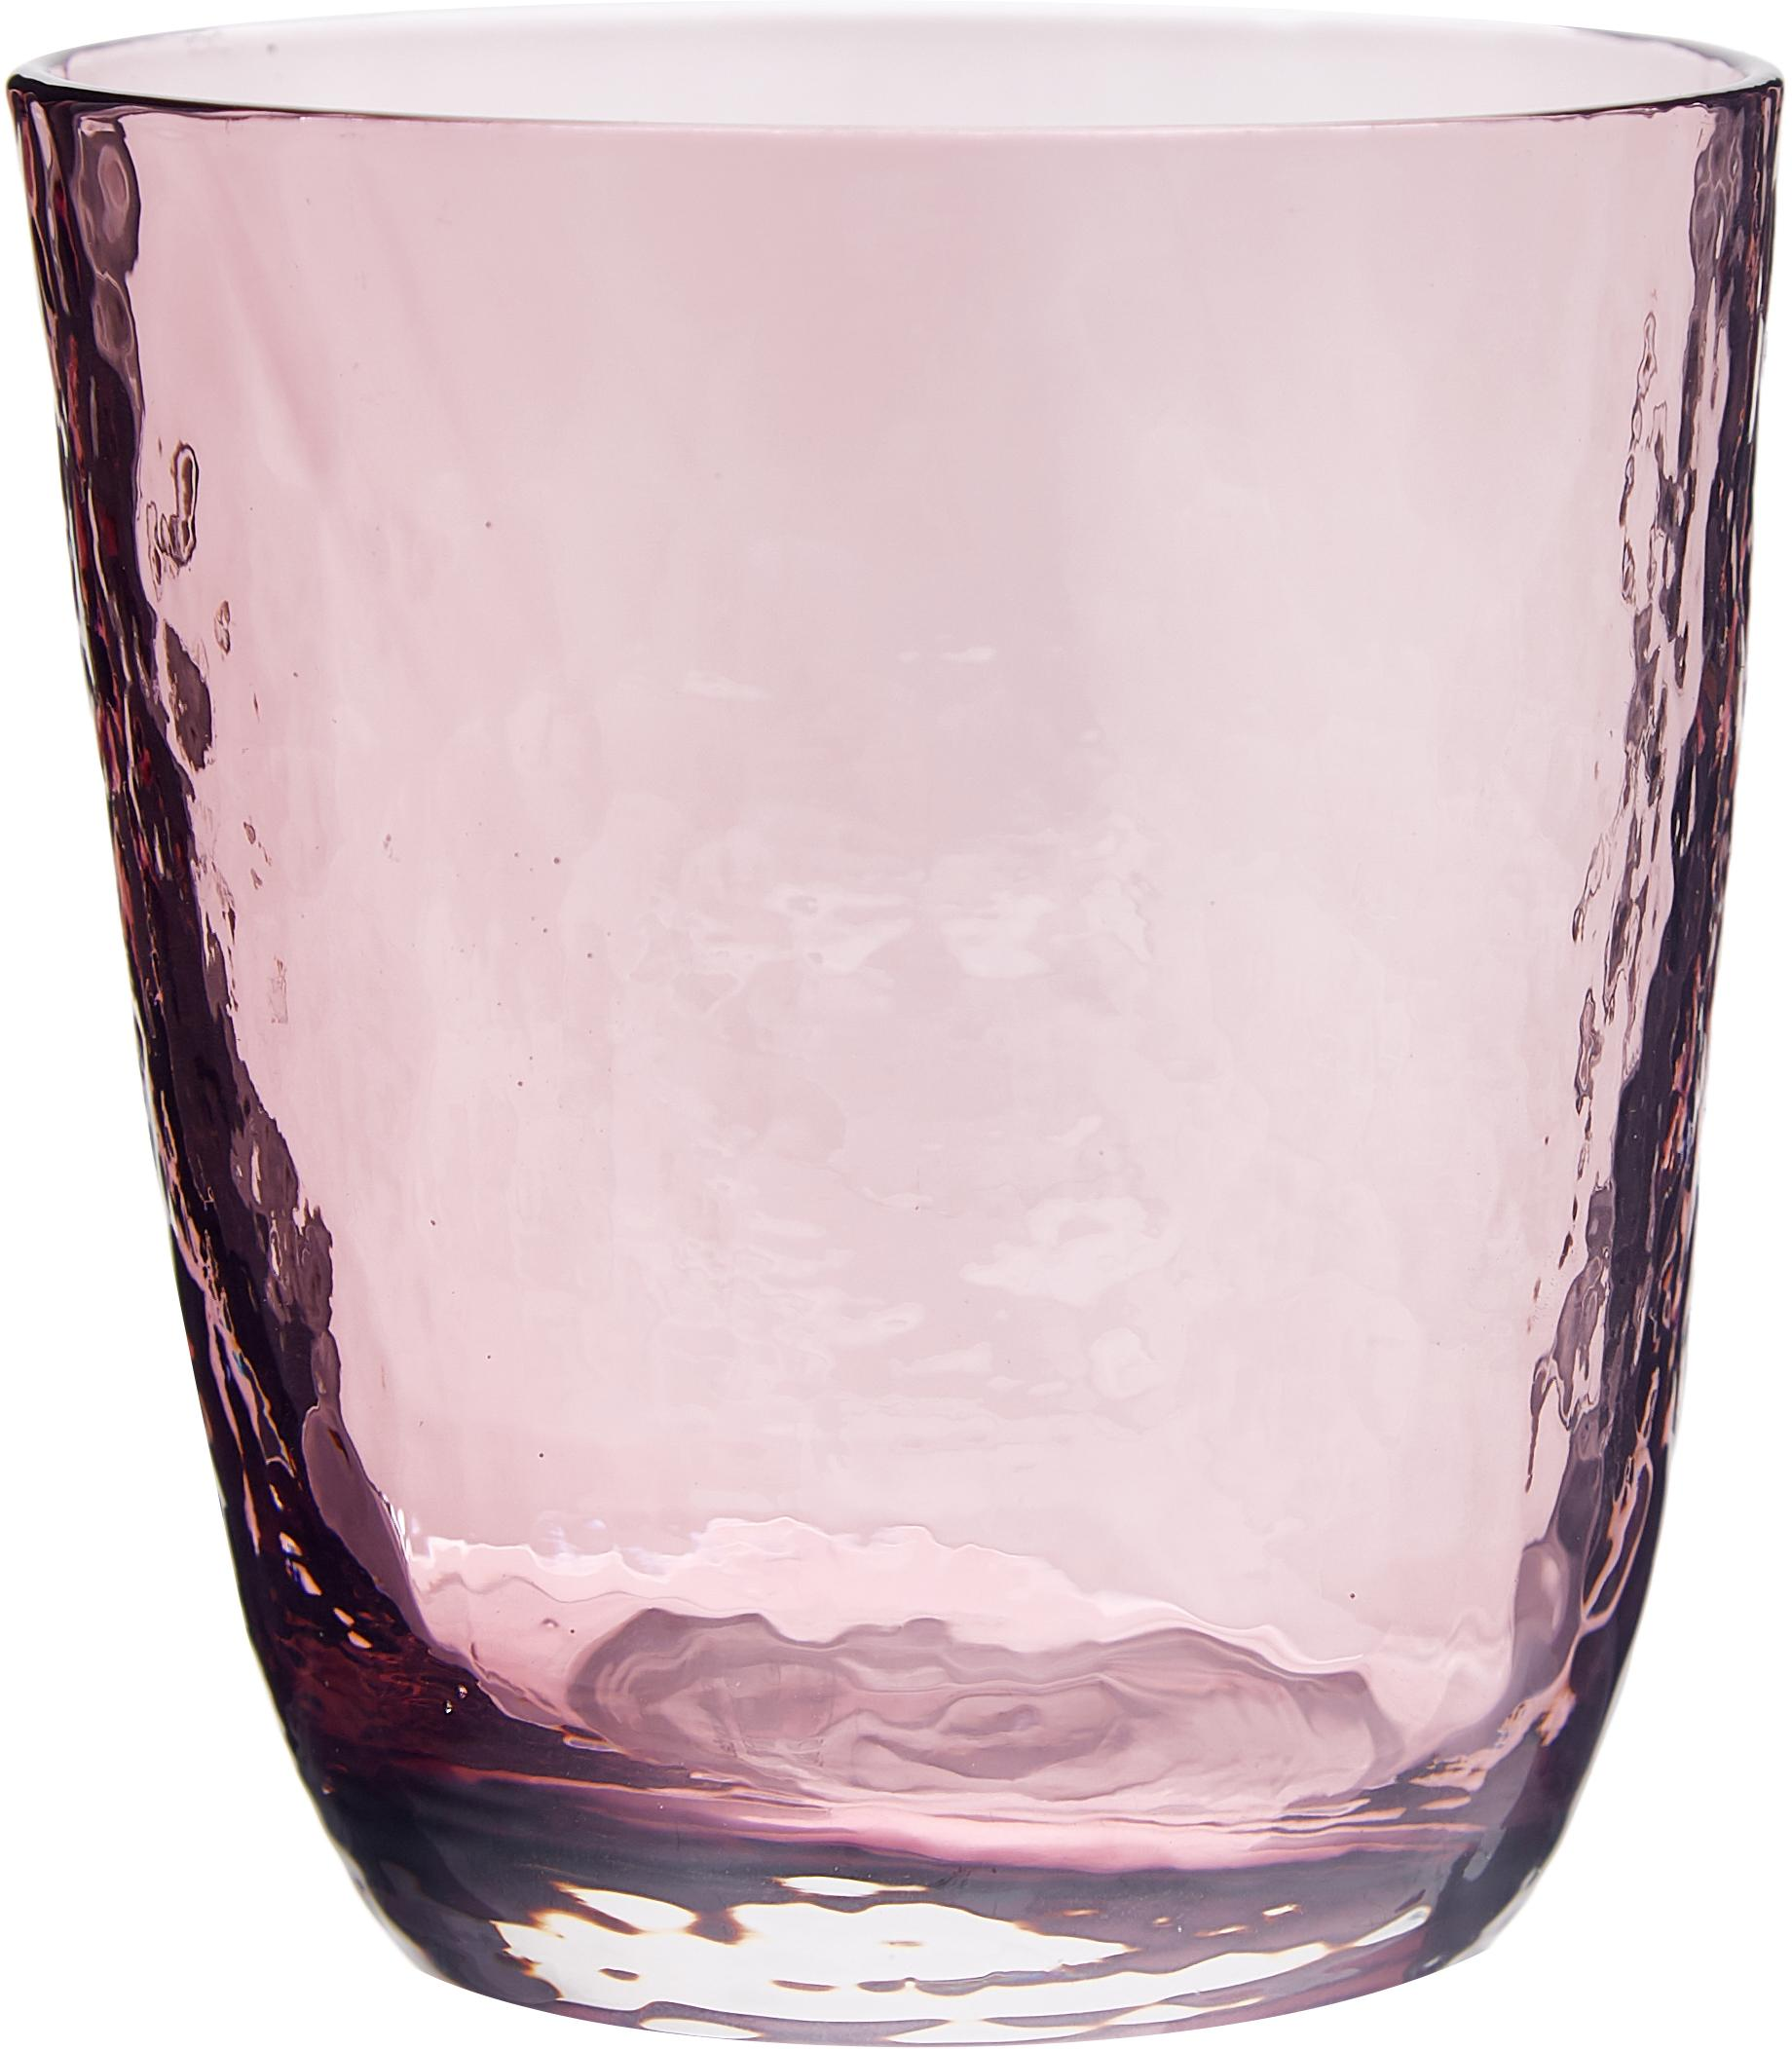 Mondgeblazen waterglazen Hammered, 4 stuks, Mondgeblazen glas, Lila, transparant, Ø 9 x H 10 cm